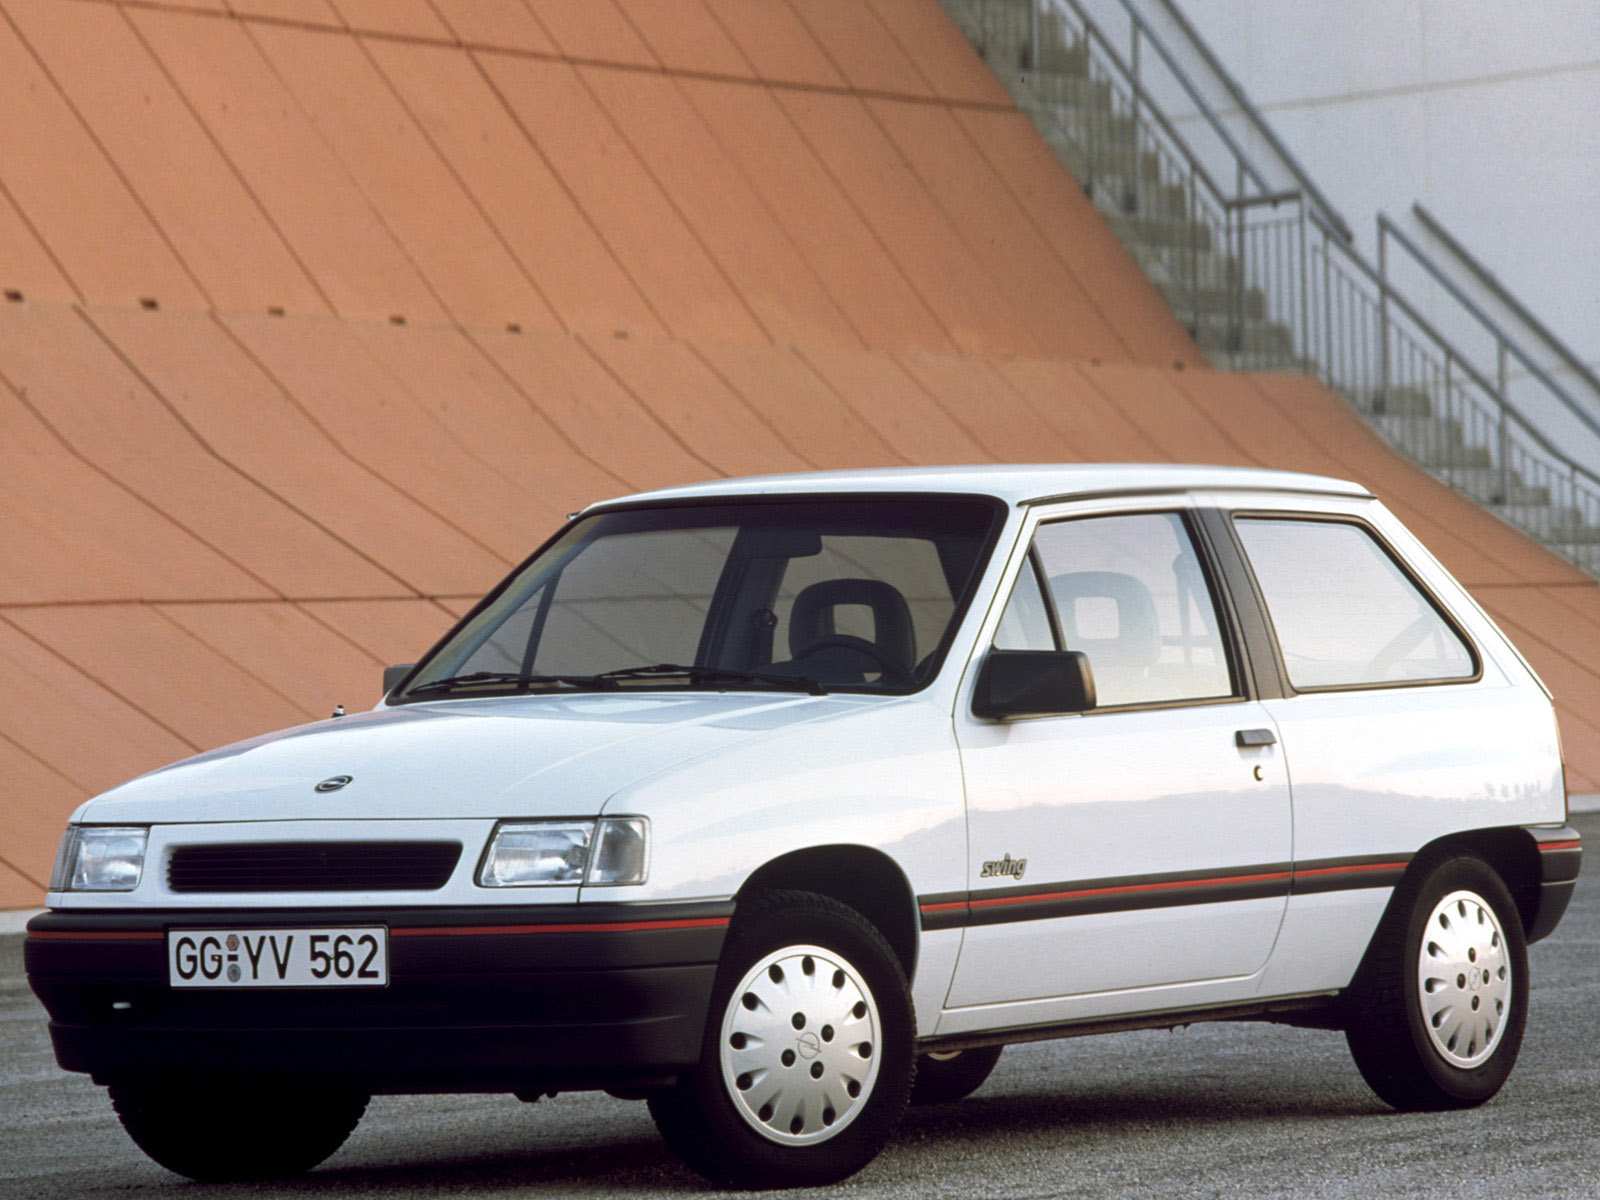 opel corsa a 3 door 1990 1993 opel corsa a 3 door 1990 1993 photo 01 car in pictures car. Black Bedroom Furniture Sets. Home Design Ideas